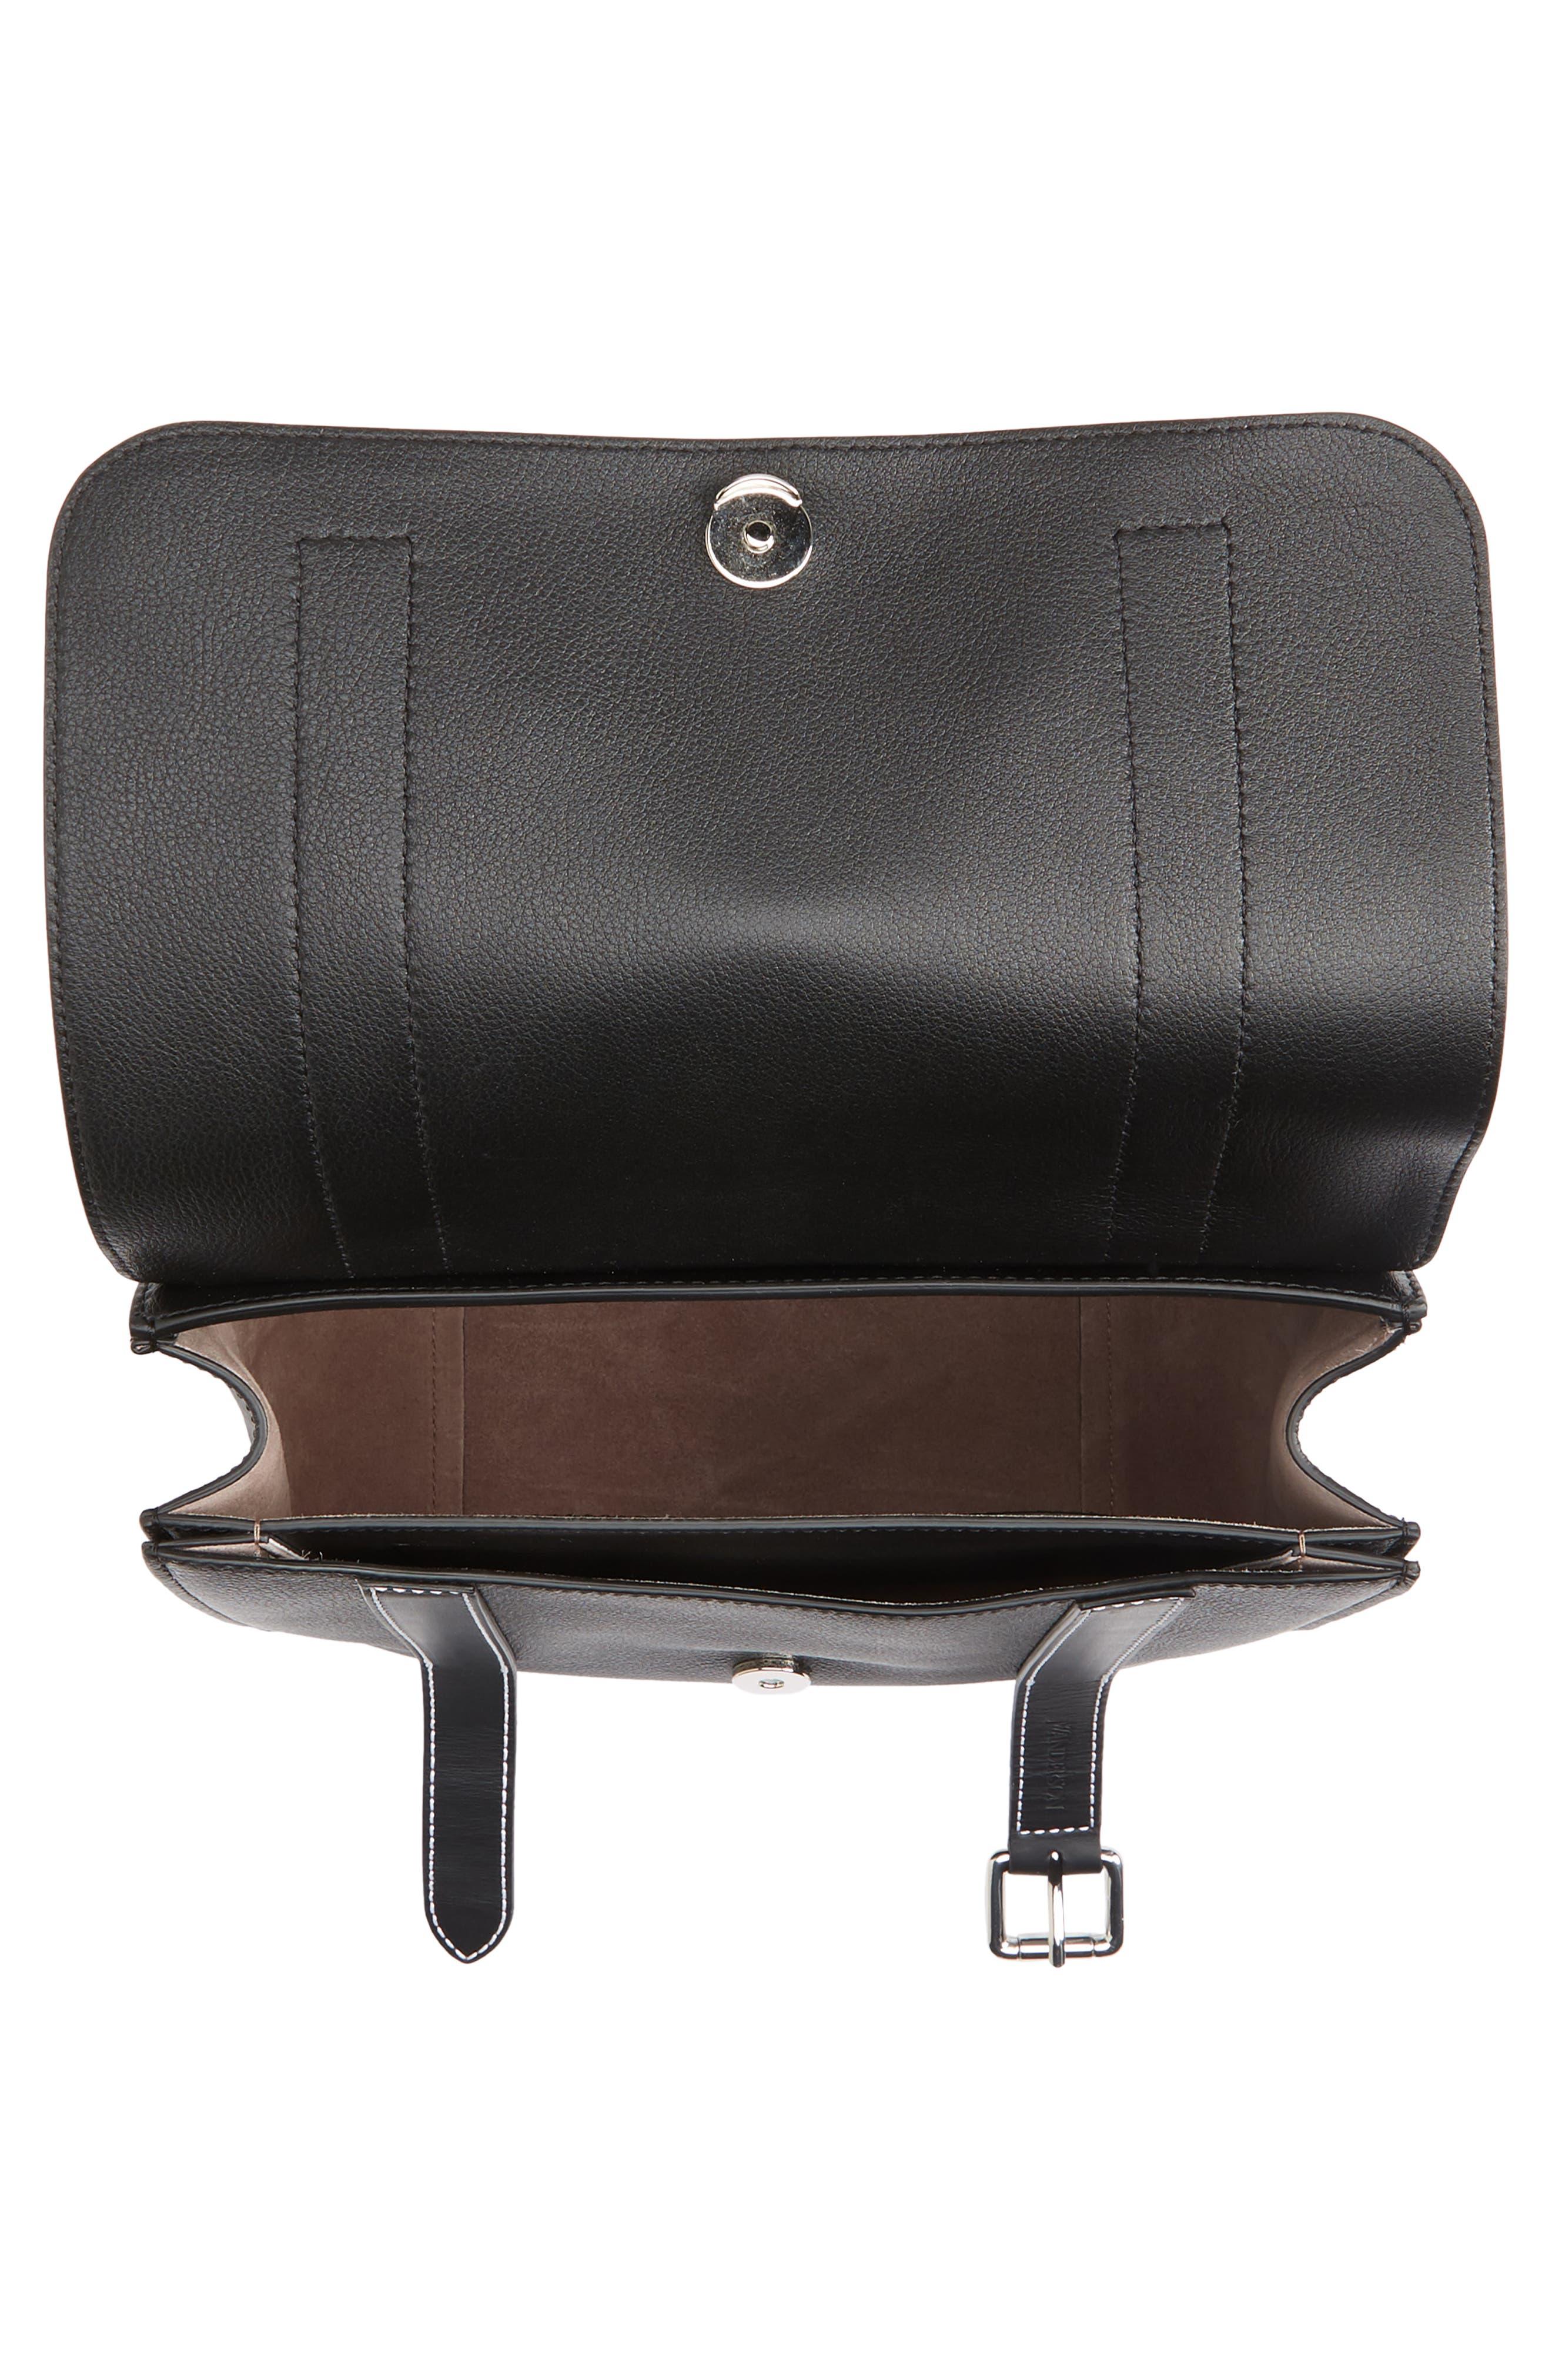 JW ANDERSON,                             Disc Leather Top Handle Satchel,                             Alternate thumbnail 4, color,                             BLACK